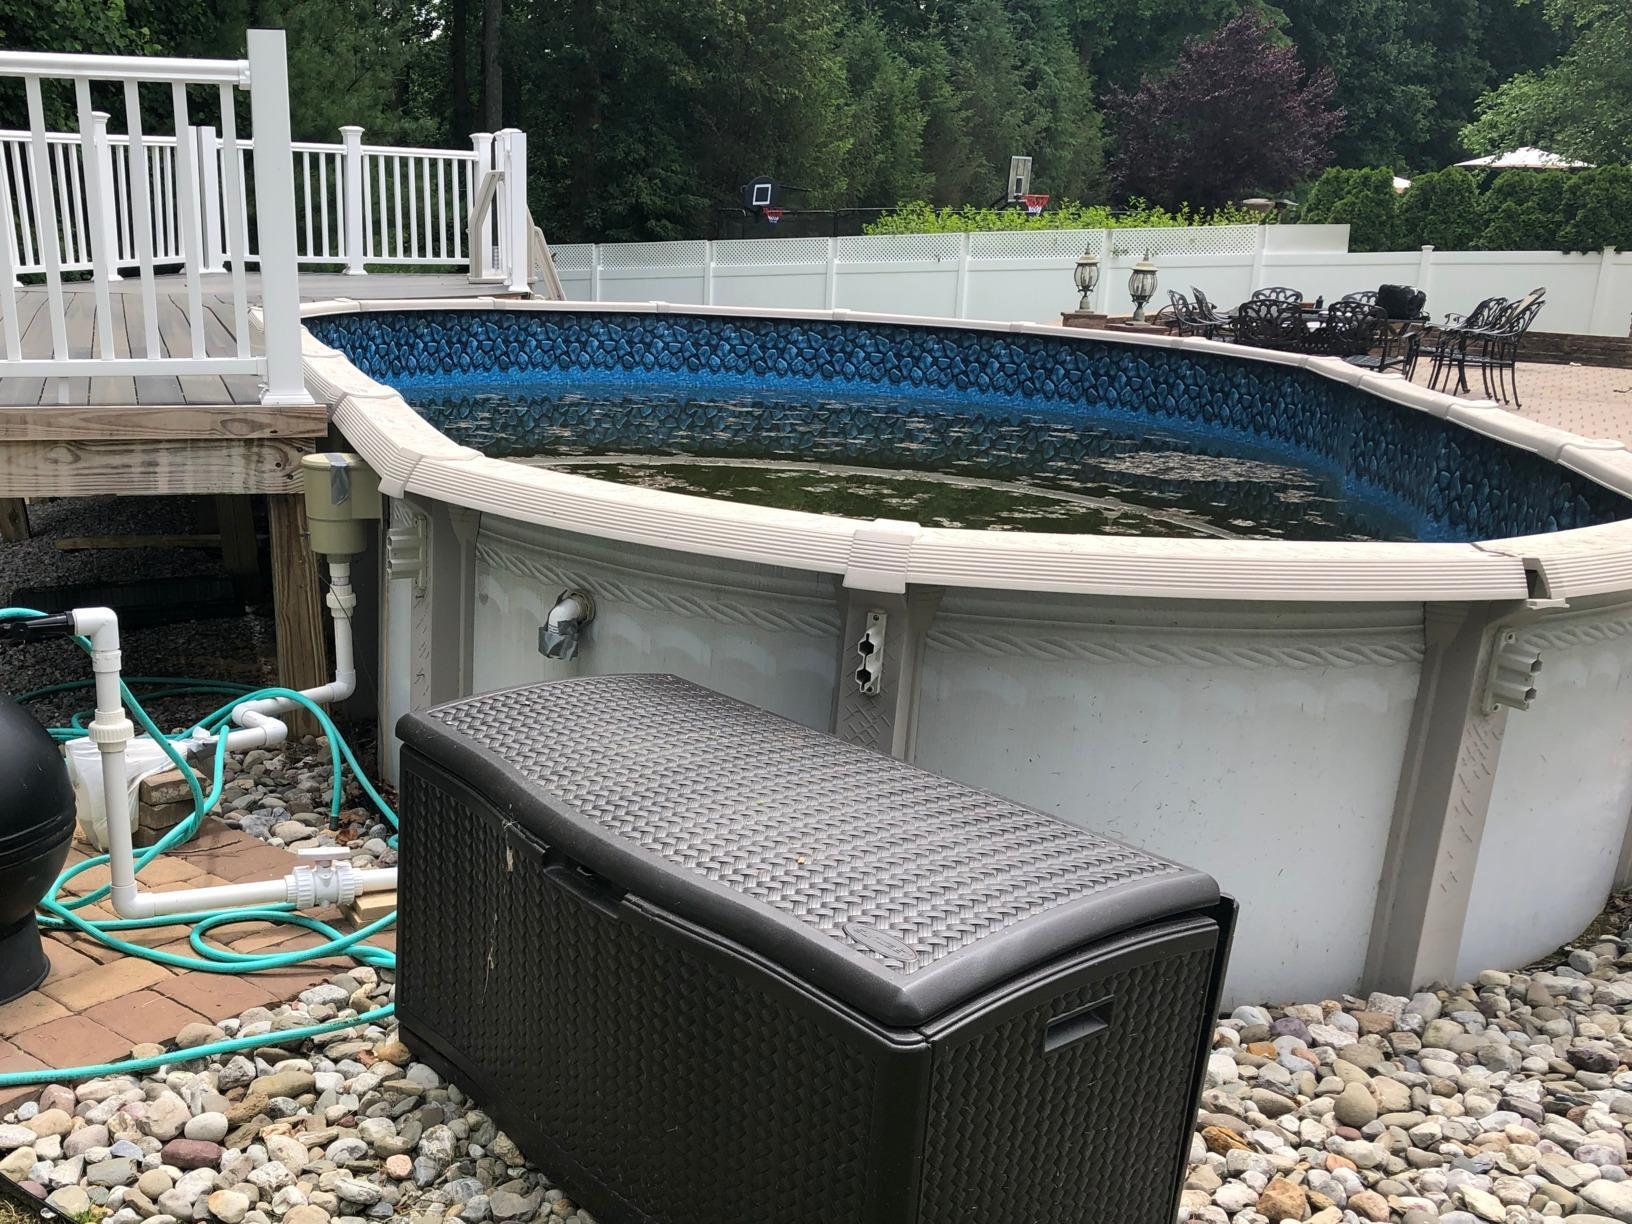 On Ground Radiant Pool Installation in Jackson, NJ - Before Photo